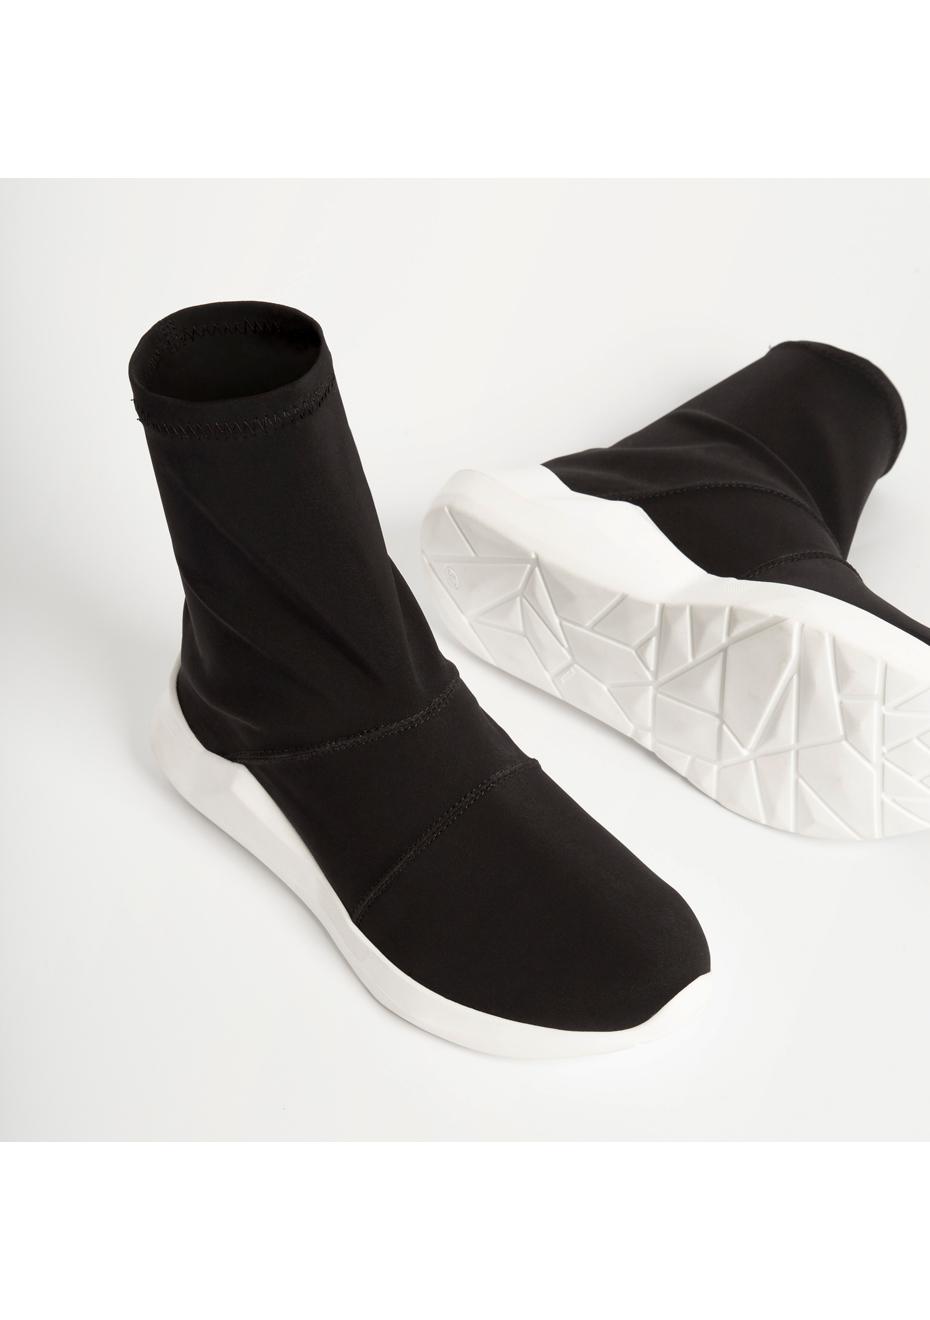 FABI Escarpins femme. Vans Ua Old Skool Weave Dx - Leather Sneakers & Tennis Basses Homme. L37 Sneakers Hot Stuff roses 69i5fAWy7